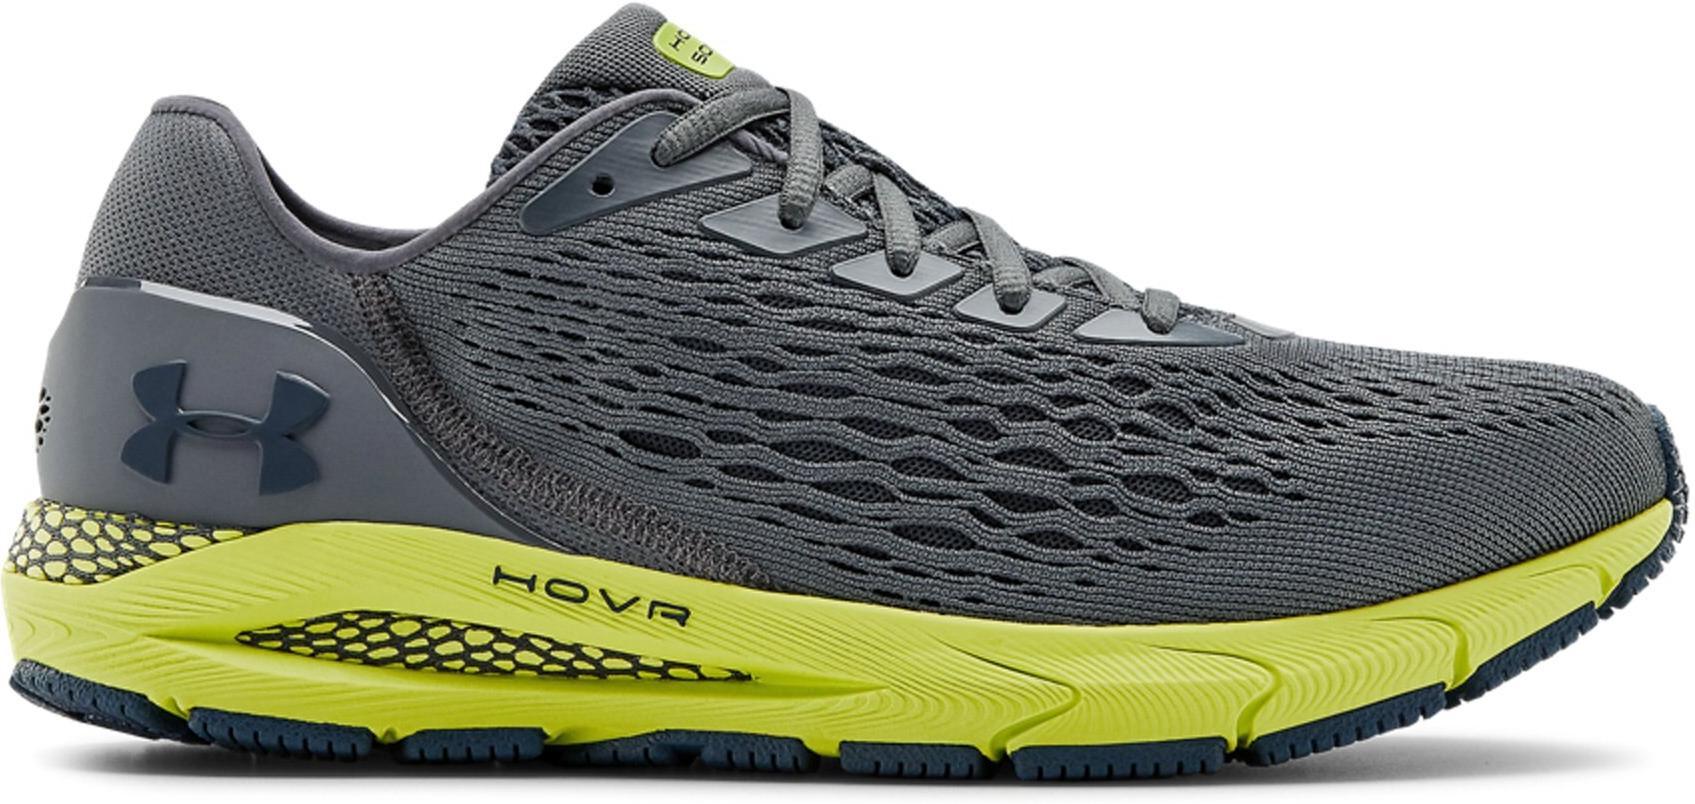 Zapatillas de running Under Armour UA HOVR Sonic 3